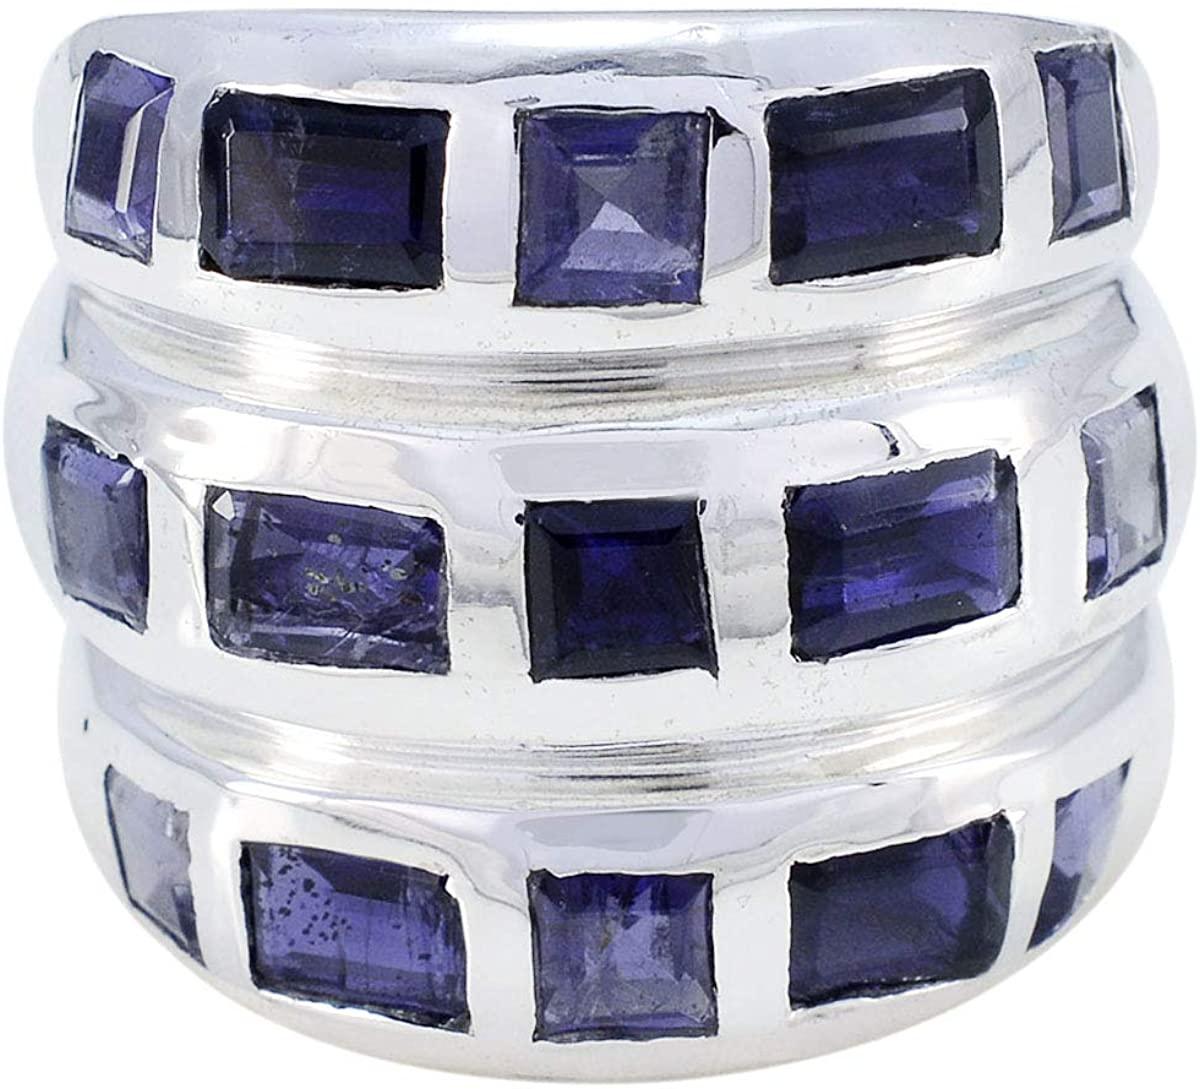 Joyas Plata Genuine Gems Square Shape Multi Stone Faceted Iolite ring-925 Sterling Silver Blue Iolite Ring-February Birth Aquarius Astrology Genuine Gems Ring SRIOLFC-7235-4 us